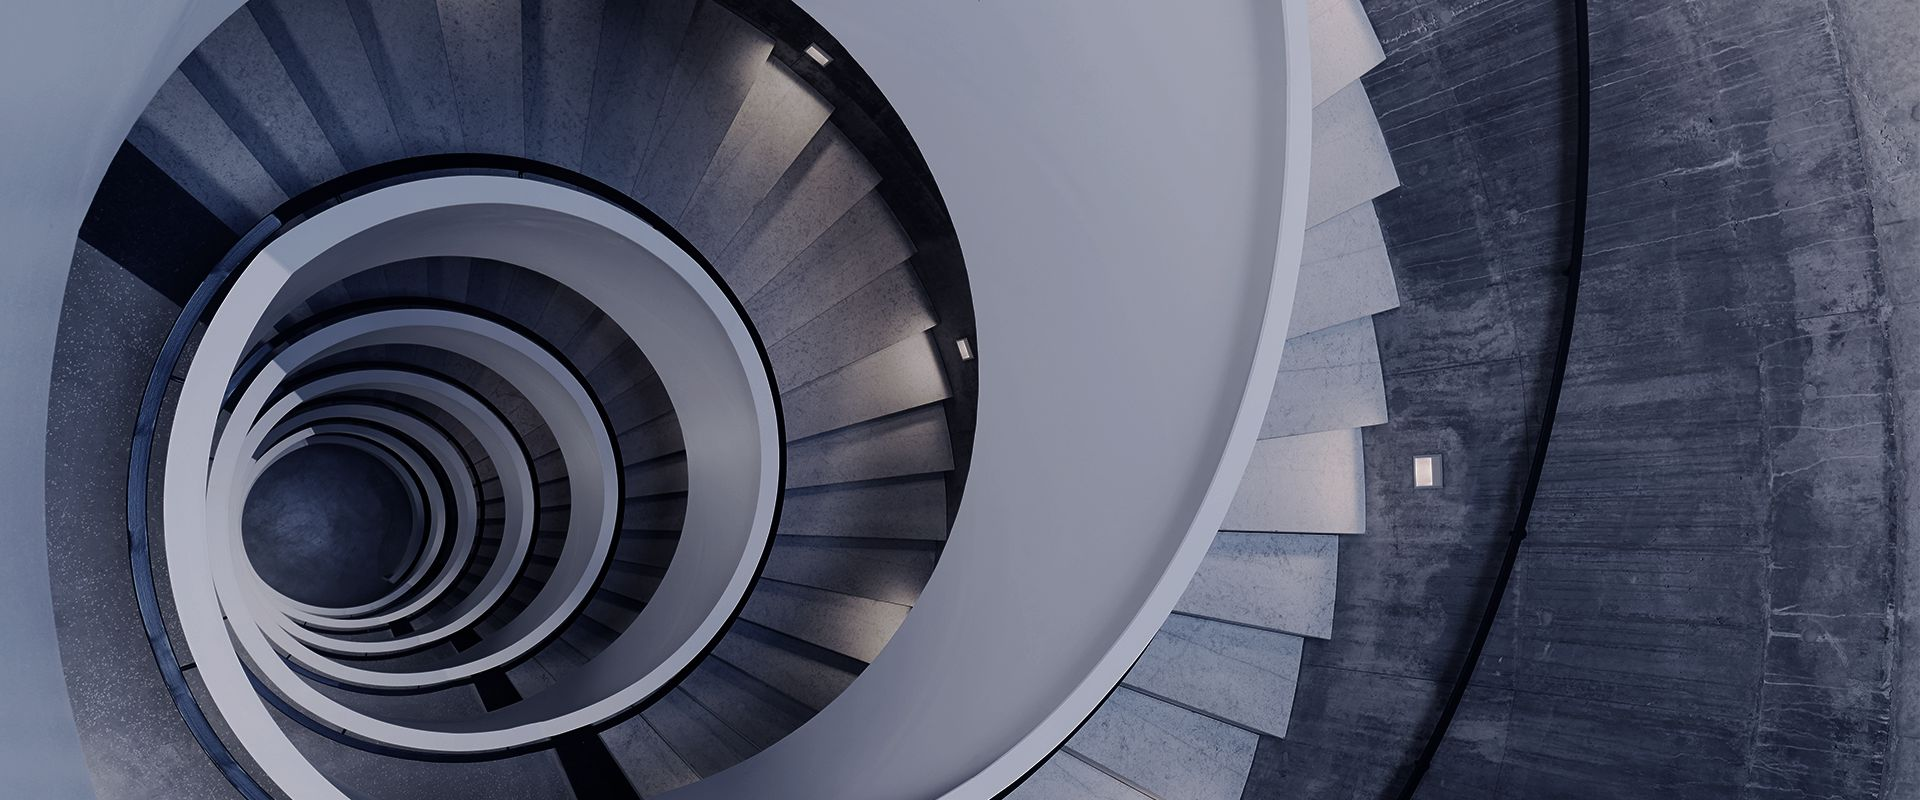 Nya Arkitekturskolans trappa ovanifrån